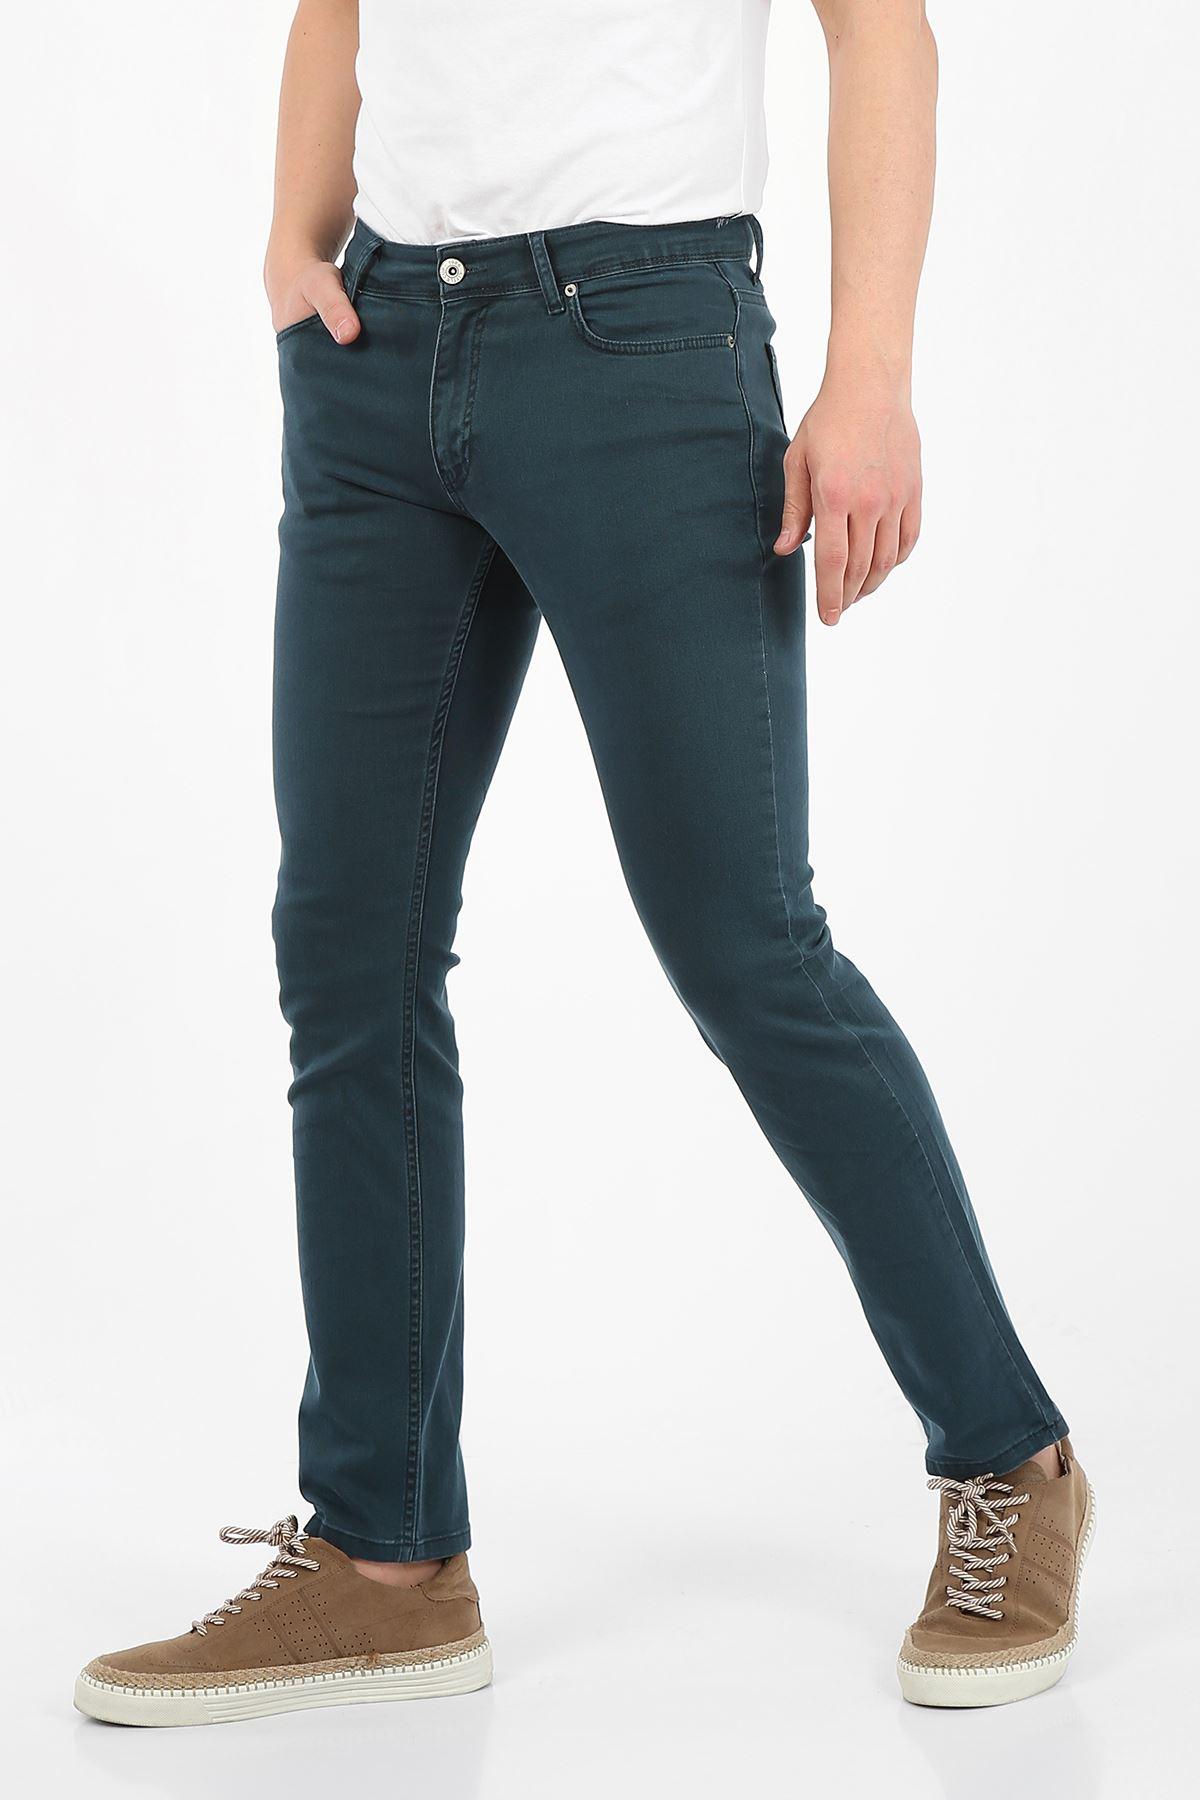 Petrol Regular Fit Fermuarlı Erkek Jeans Pantolon-FARADAY